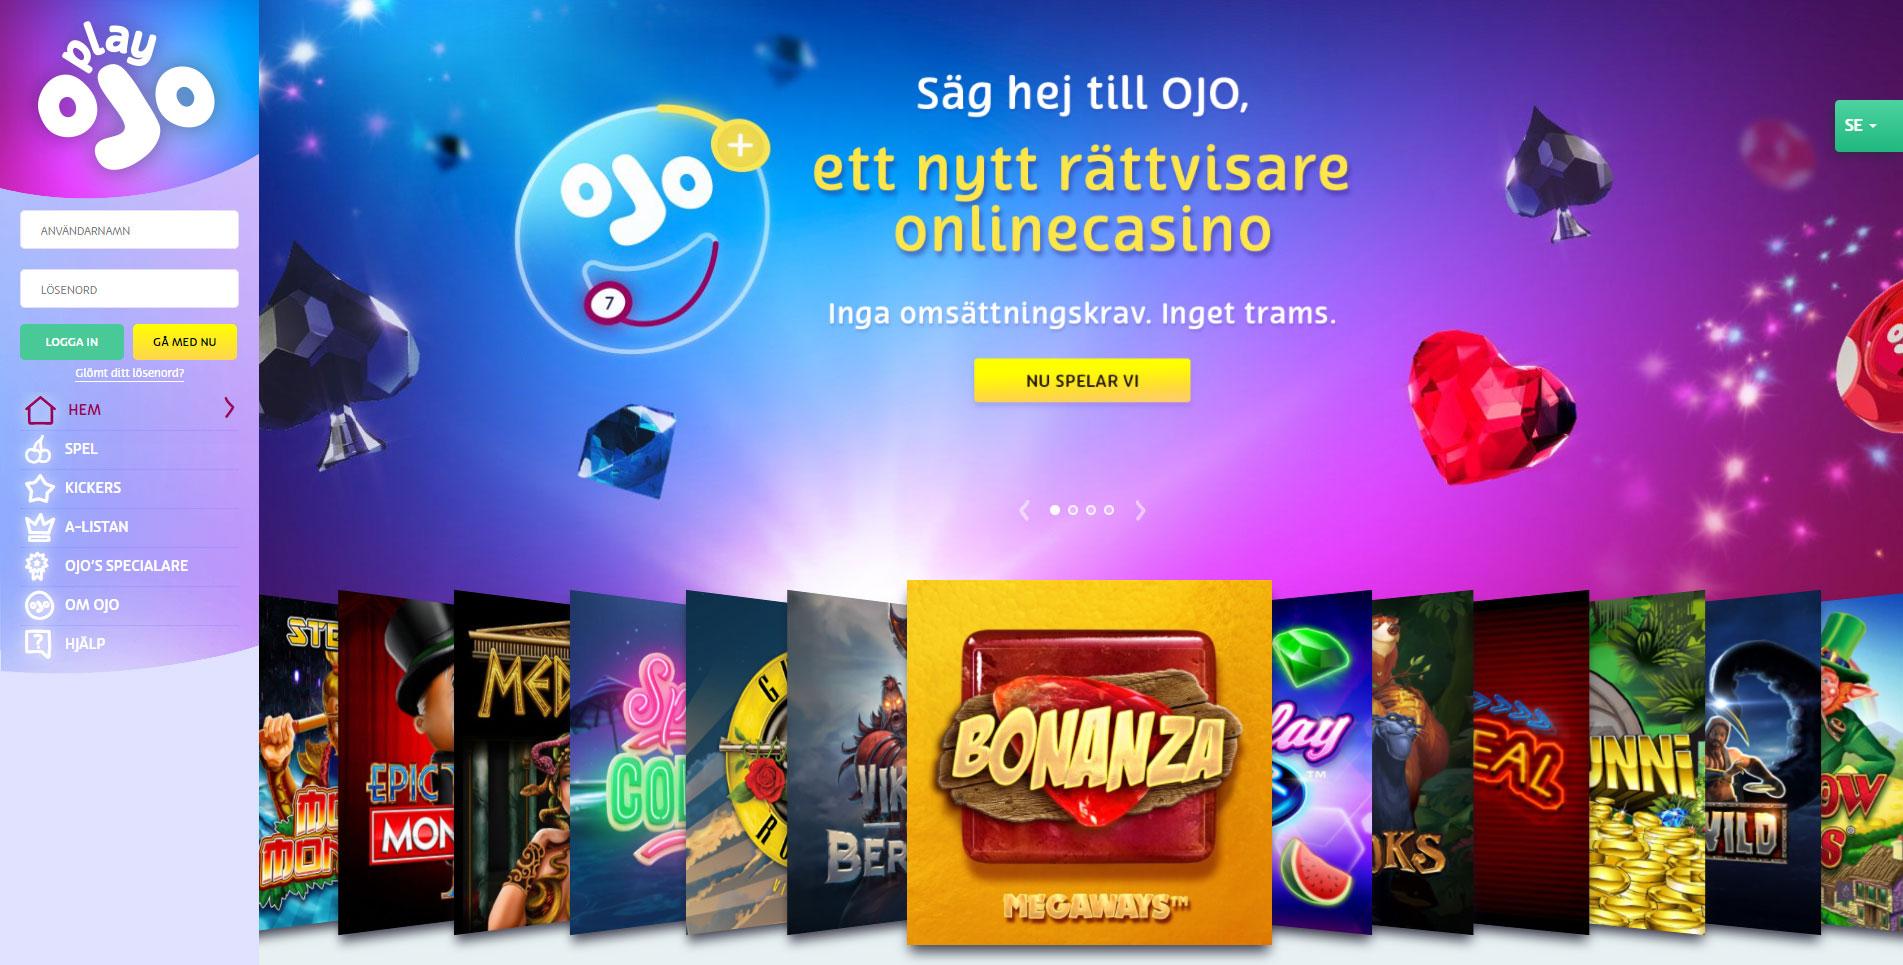 Play OJO Casino Bitcoin bonus